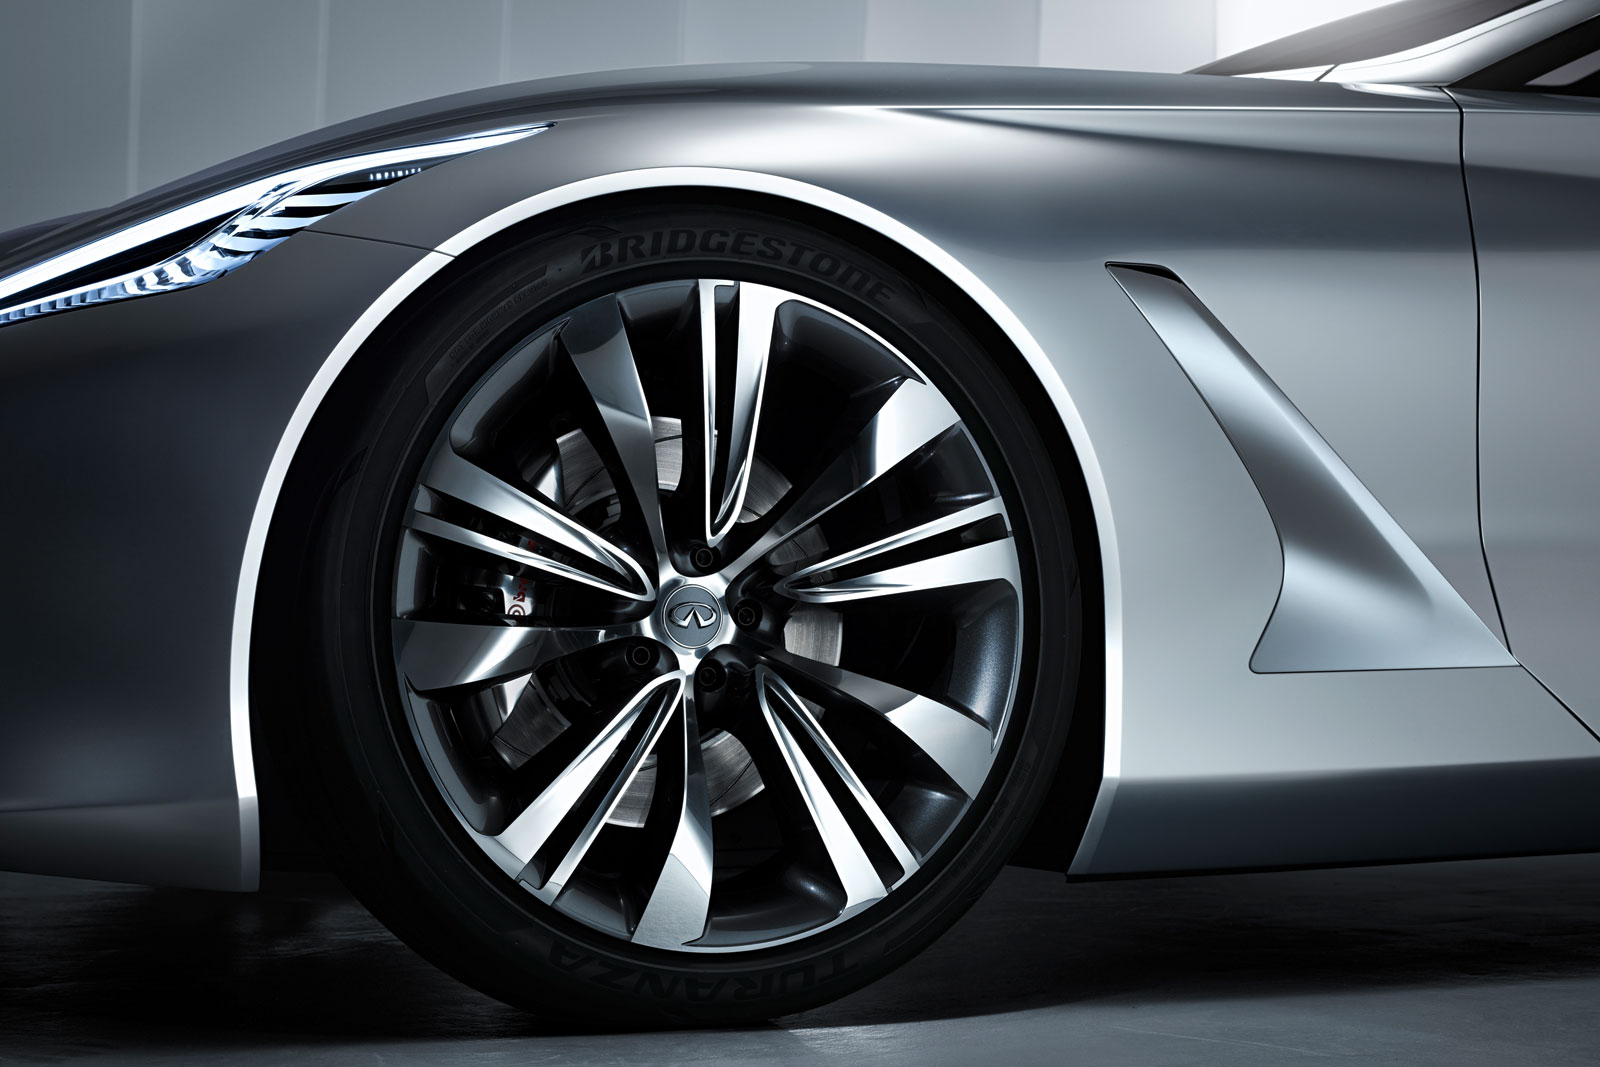 Infiniti Q80 Inspiration Concept Wheel Car Body Design